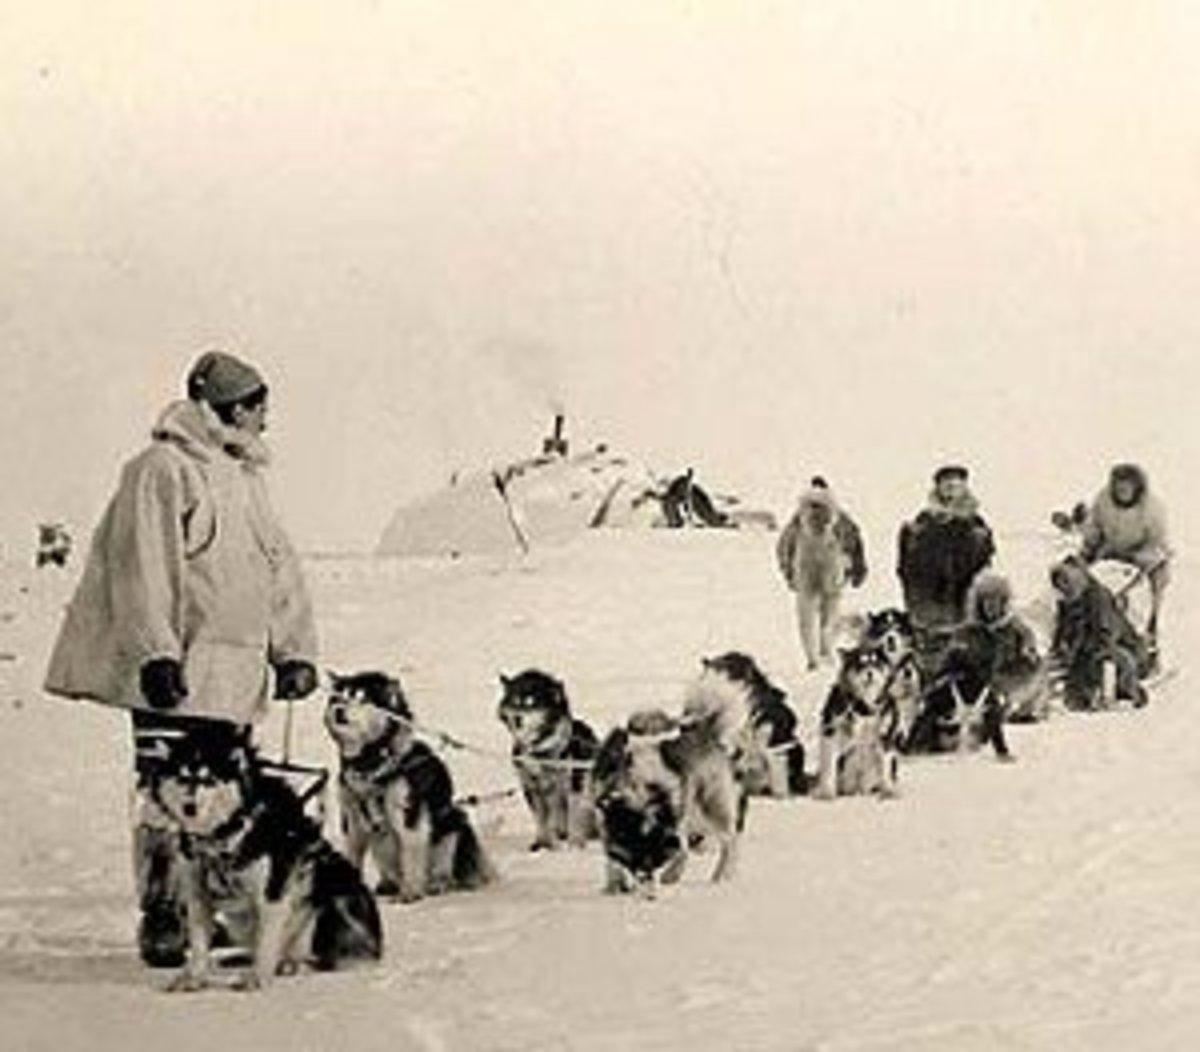 Team of Malamutes from Alaska circa 1950s